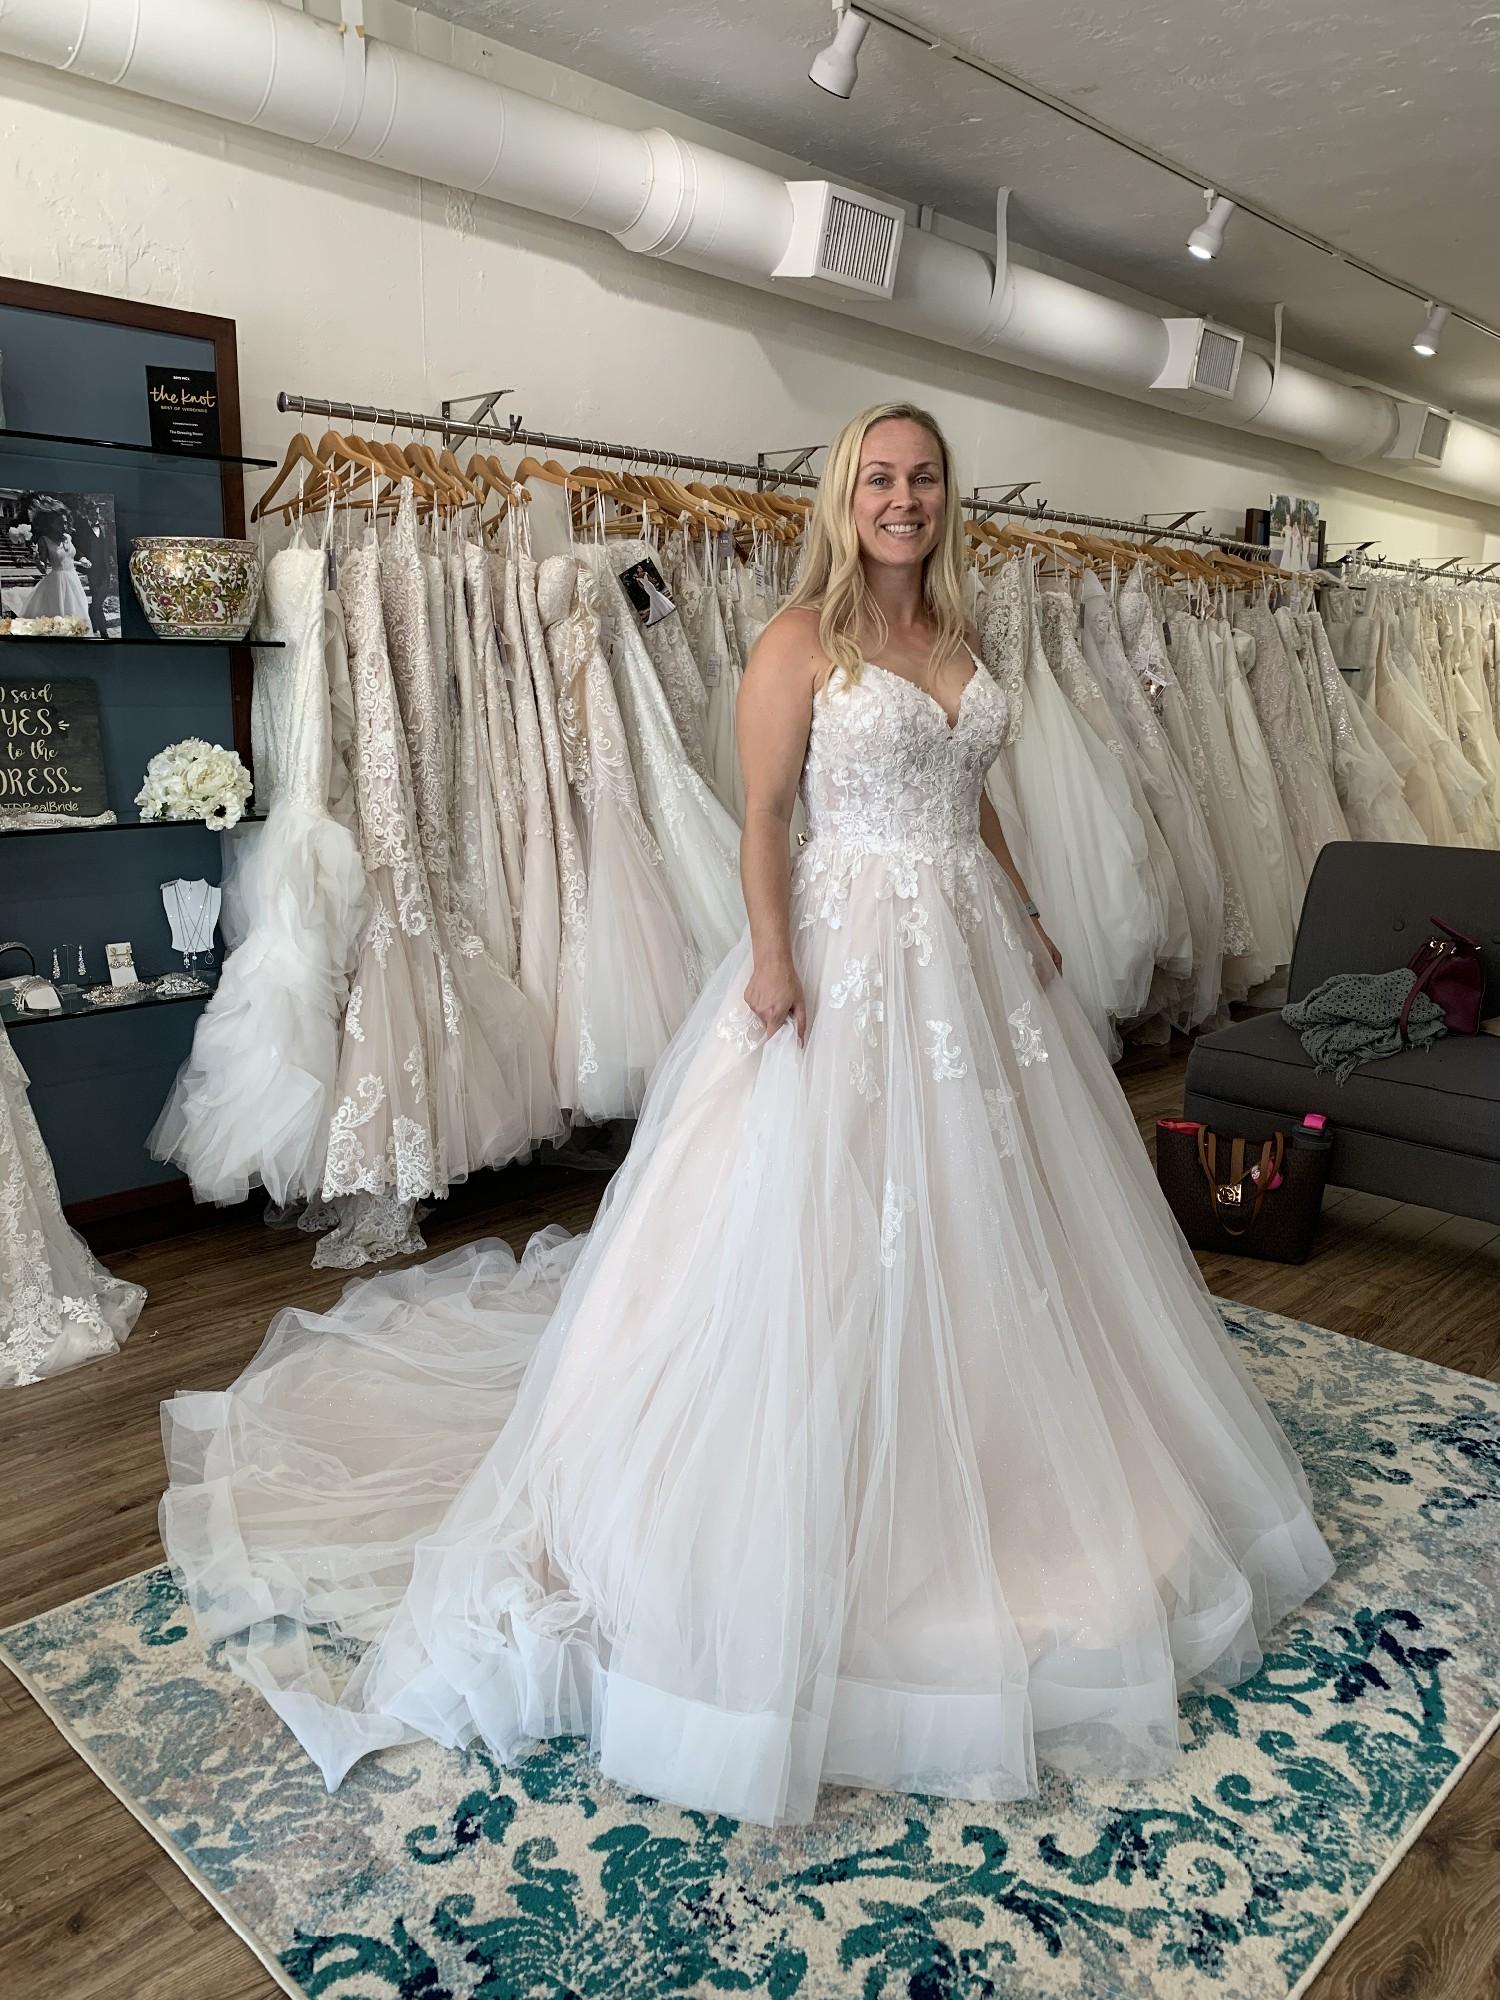 Stella York 6886 New Wedding Dress Save 20% - Stillwhite